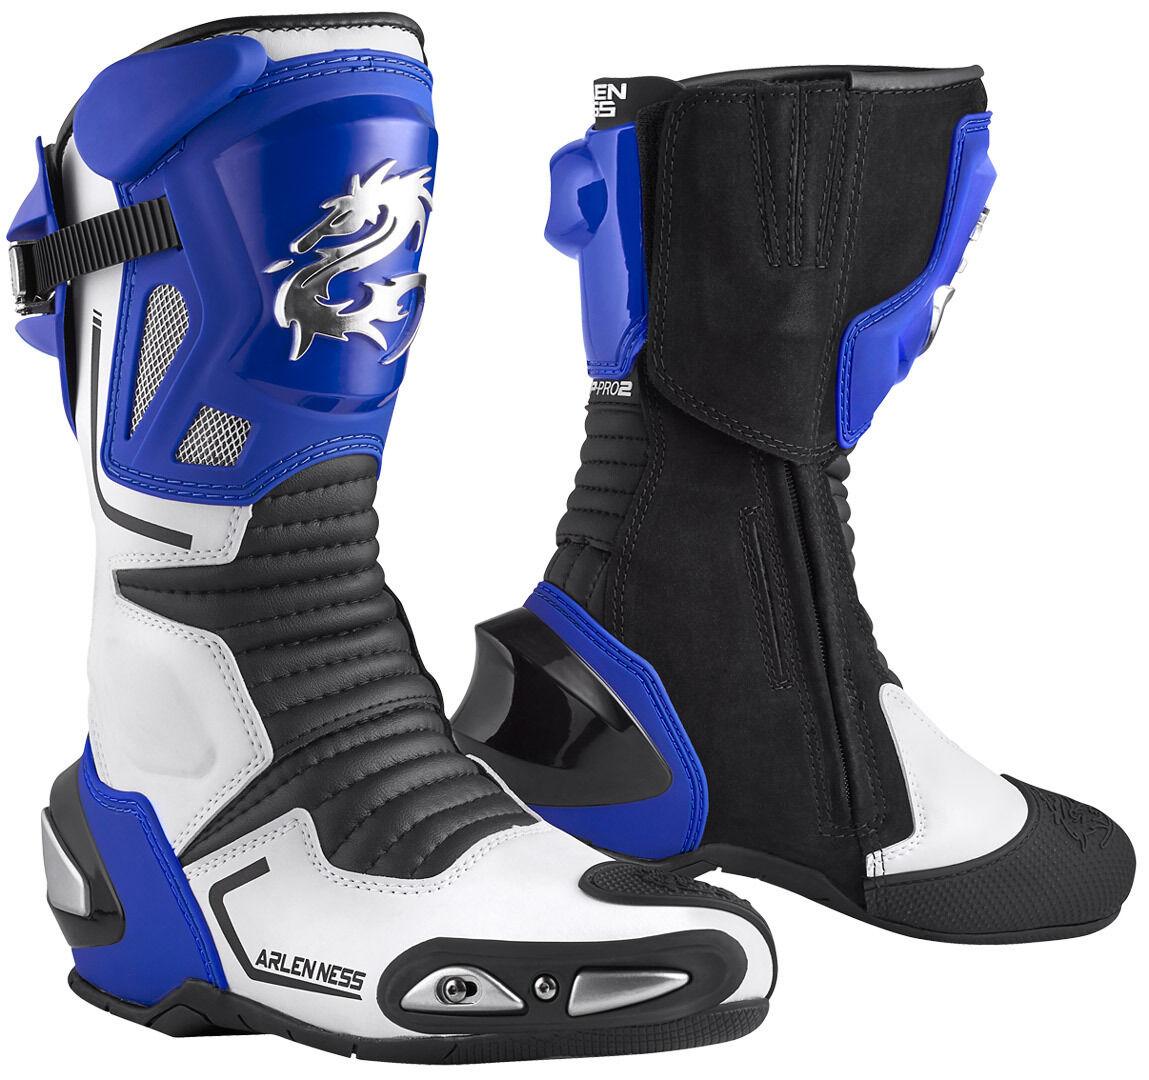 Arlen Ness Sugello Bottes de moto Noir Blanc Bleu taille : 42